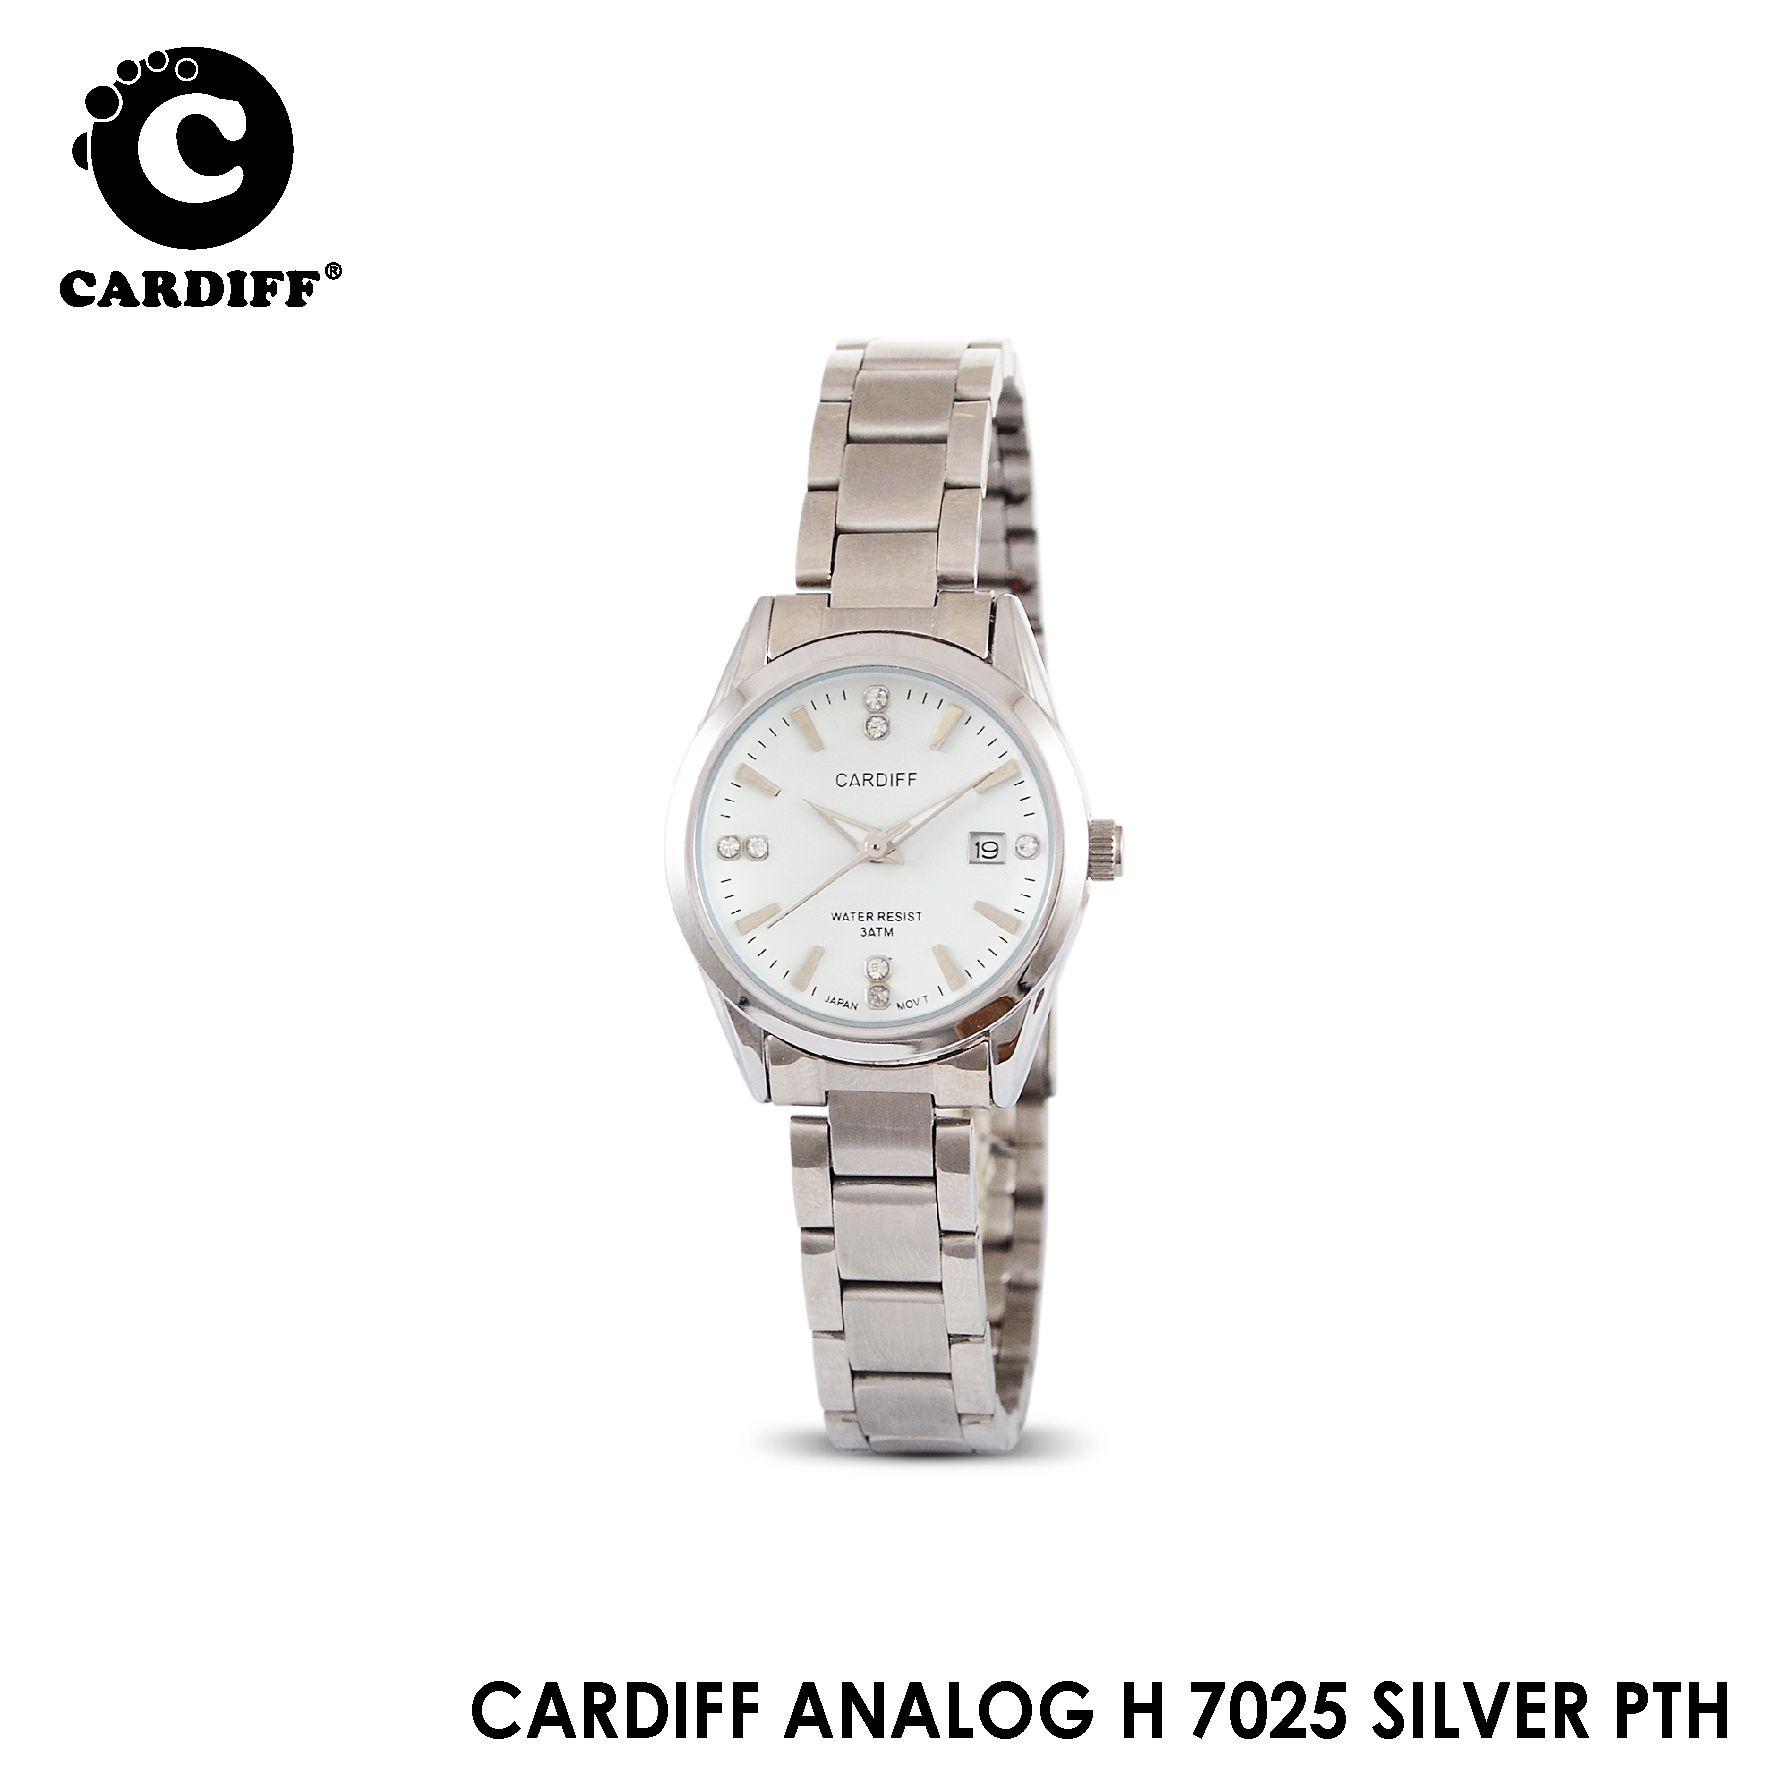 Cardiff Analog H 7025